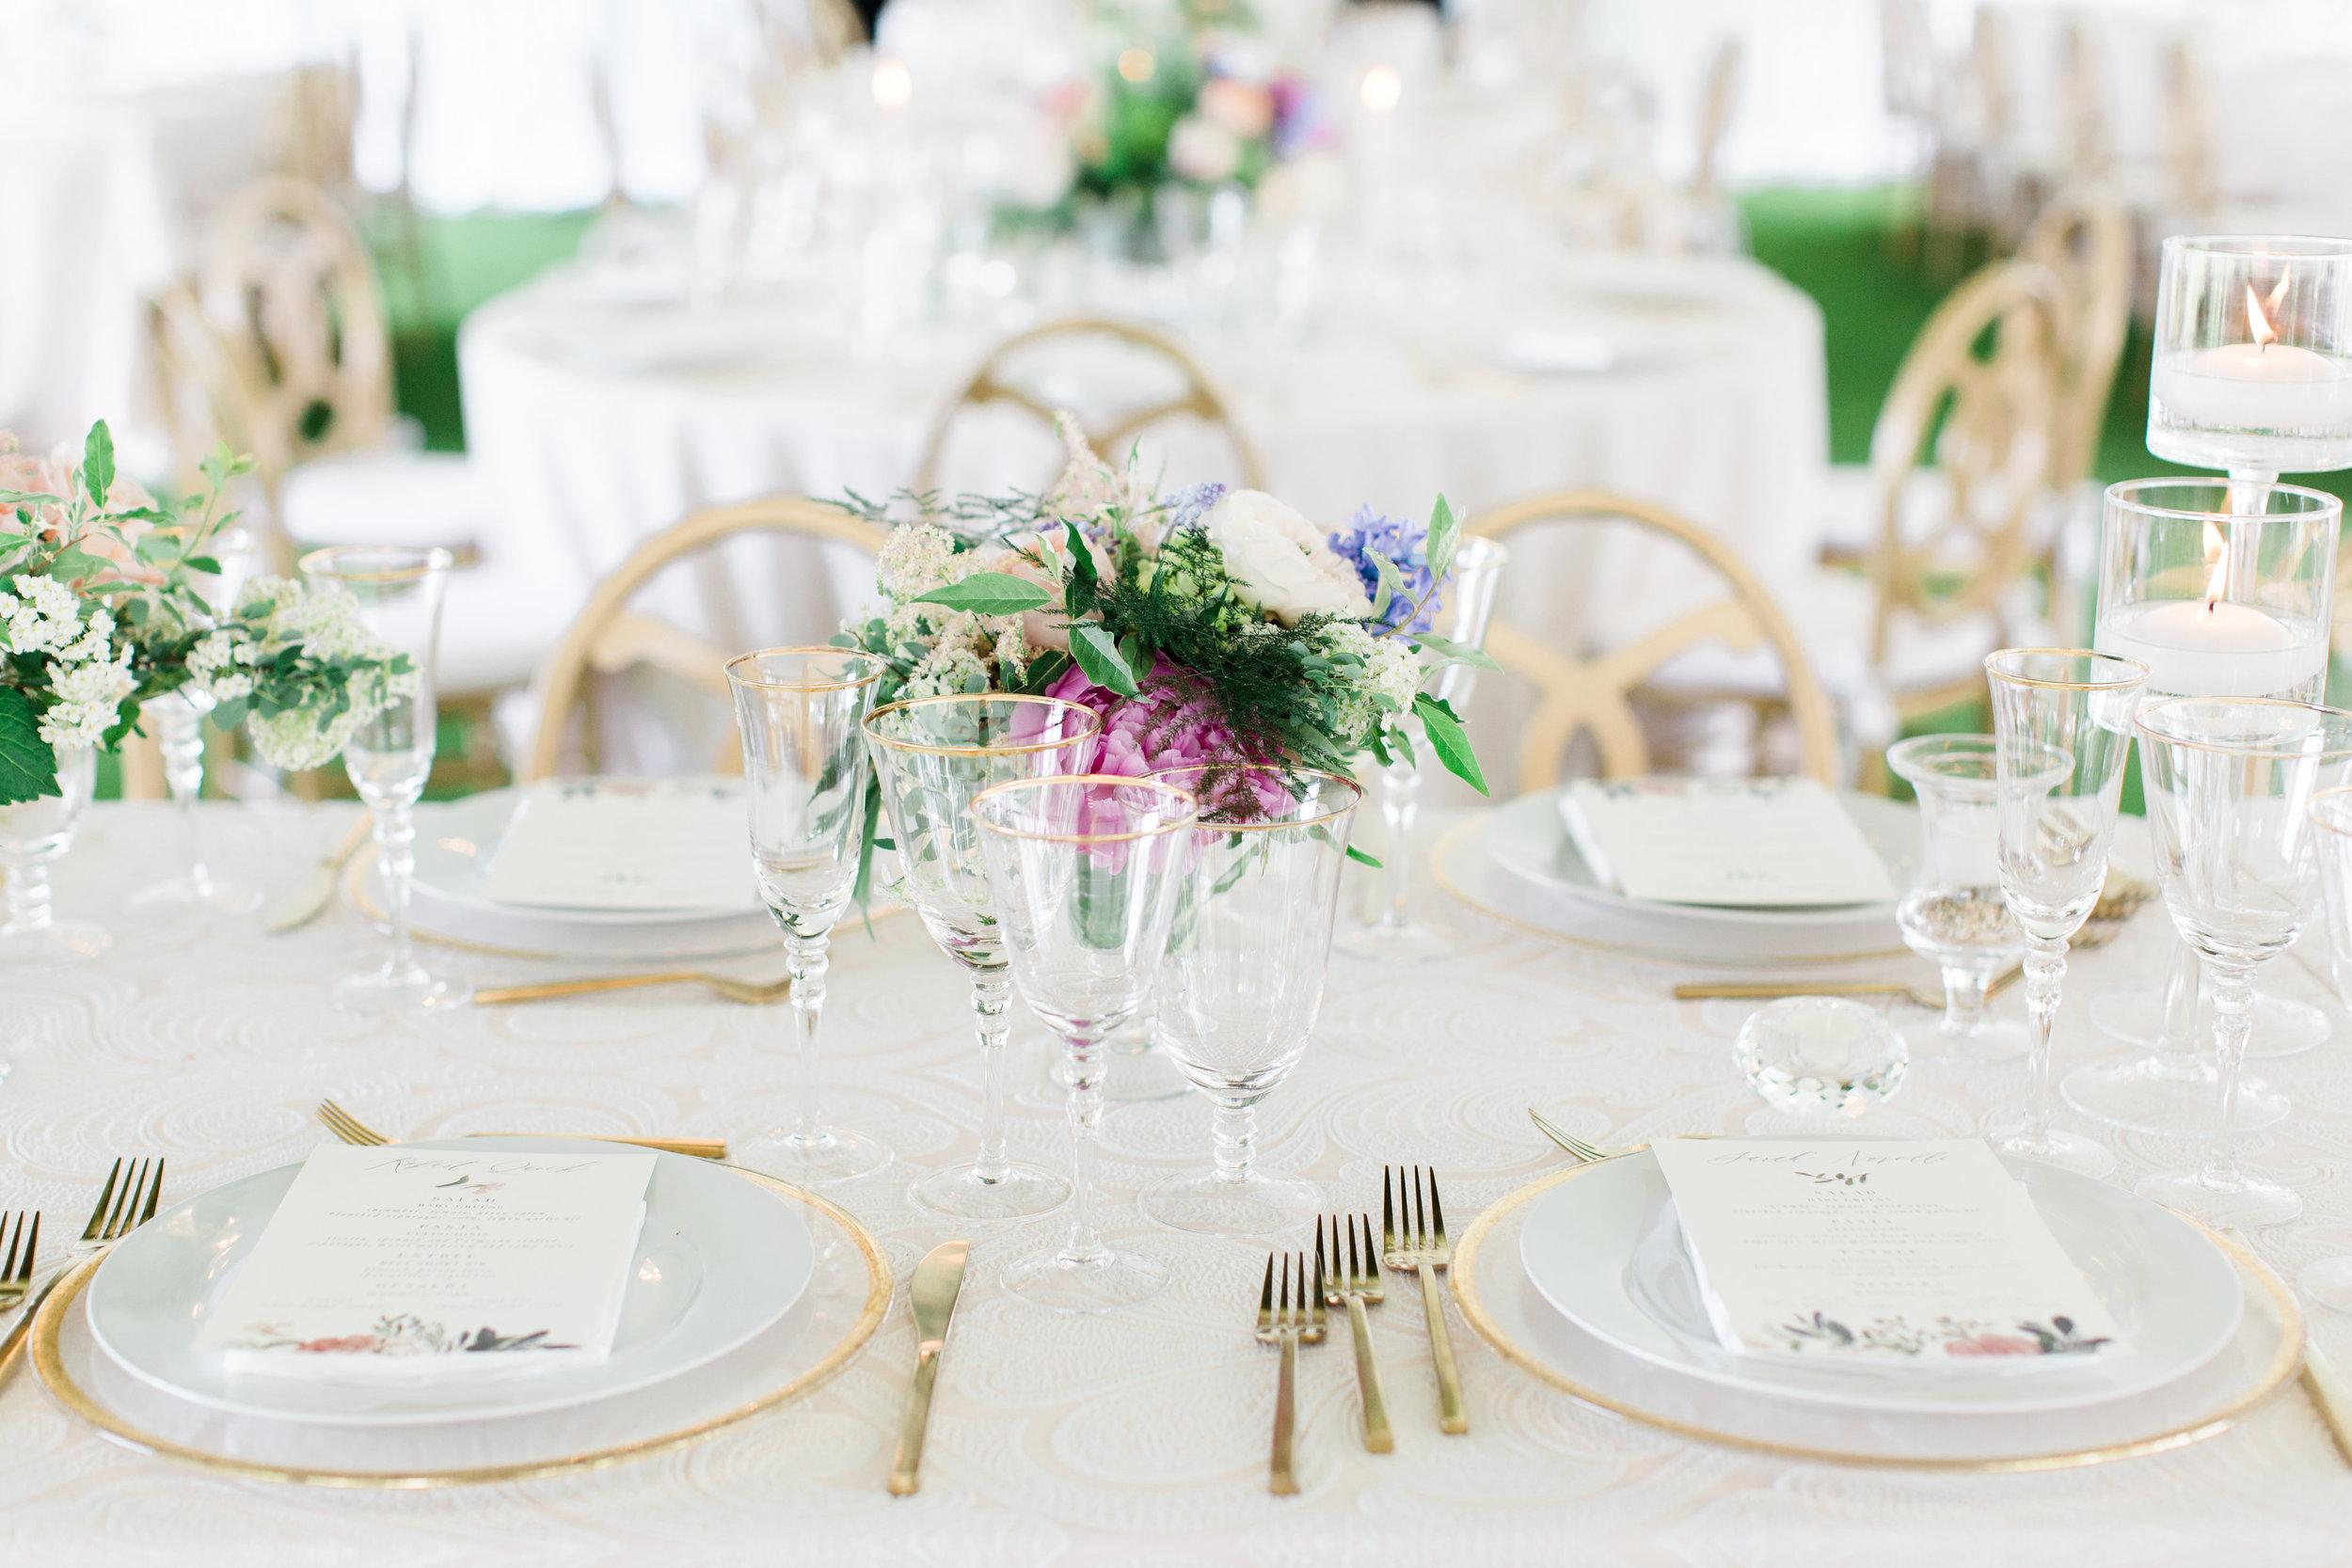 Coffman+Wedding+Reception+Details-18.jpg